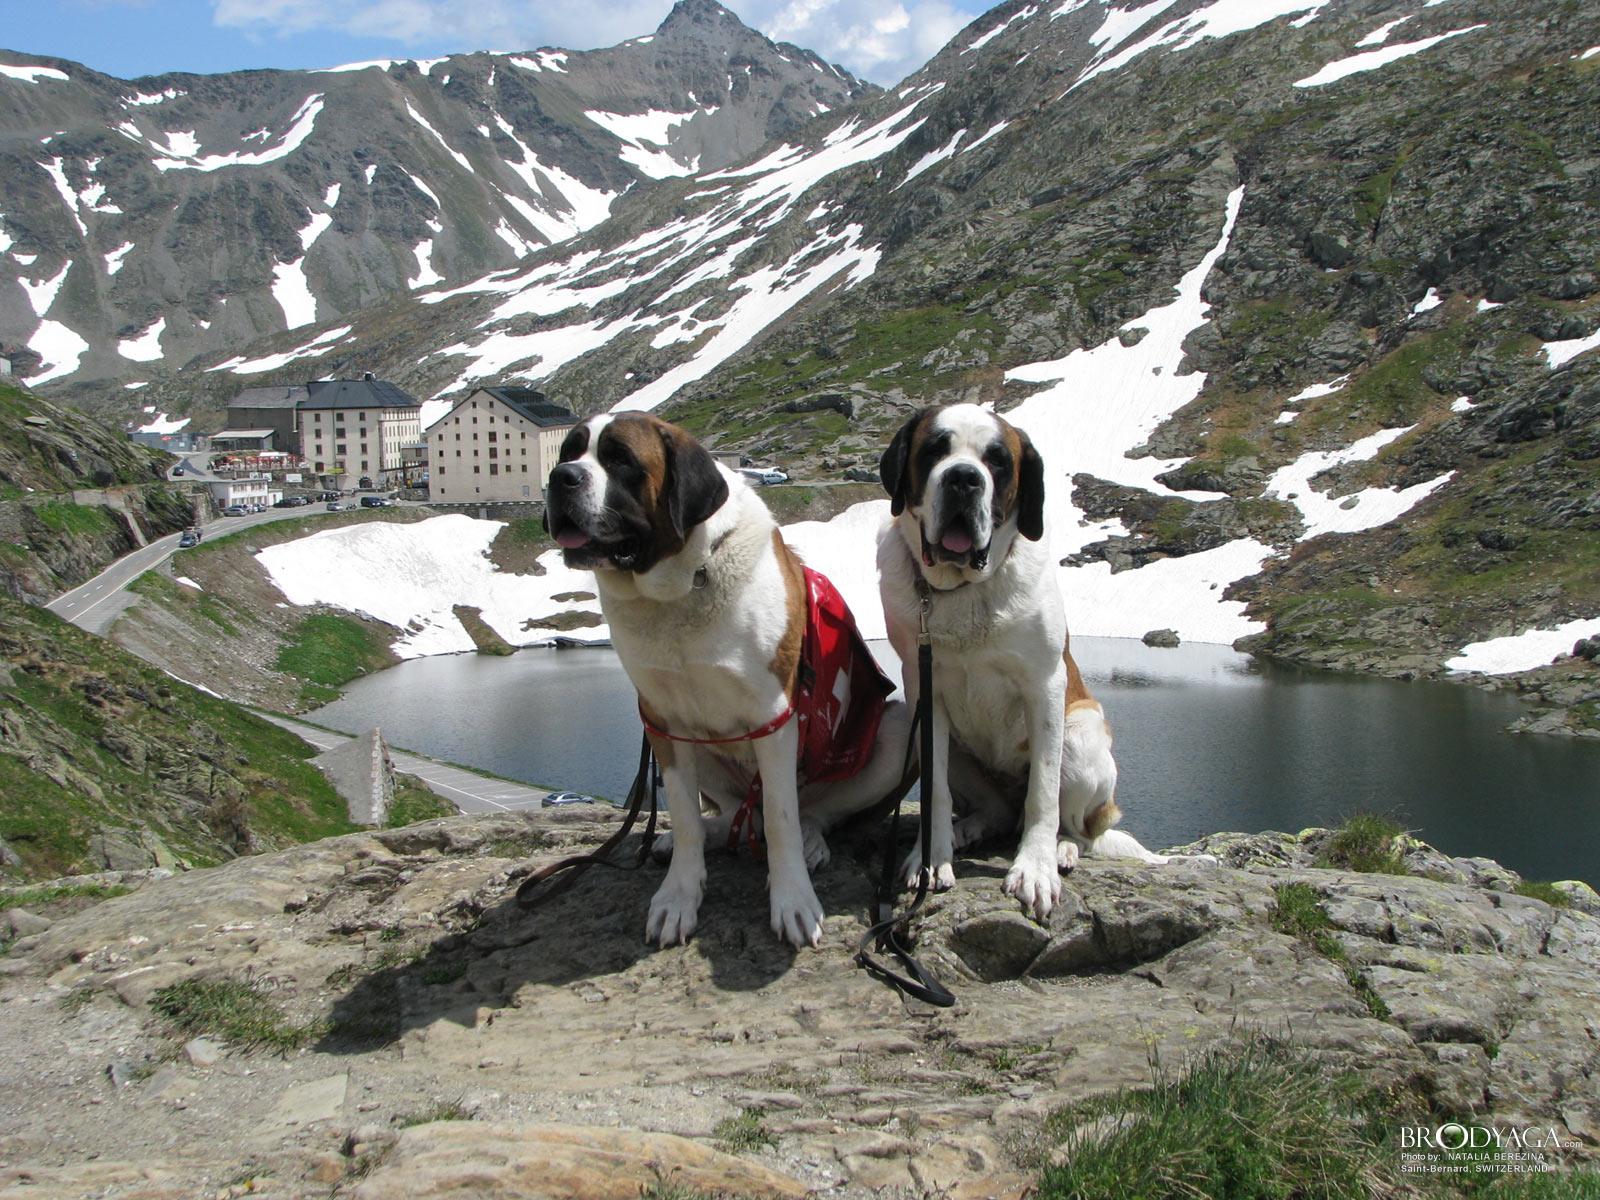 Grand-Saint-Bernard-Switzerland-1286773012www.brodyaga.com_